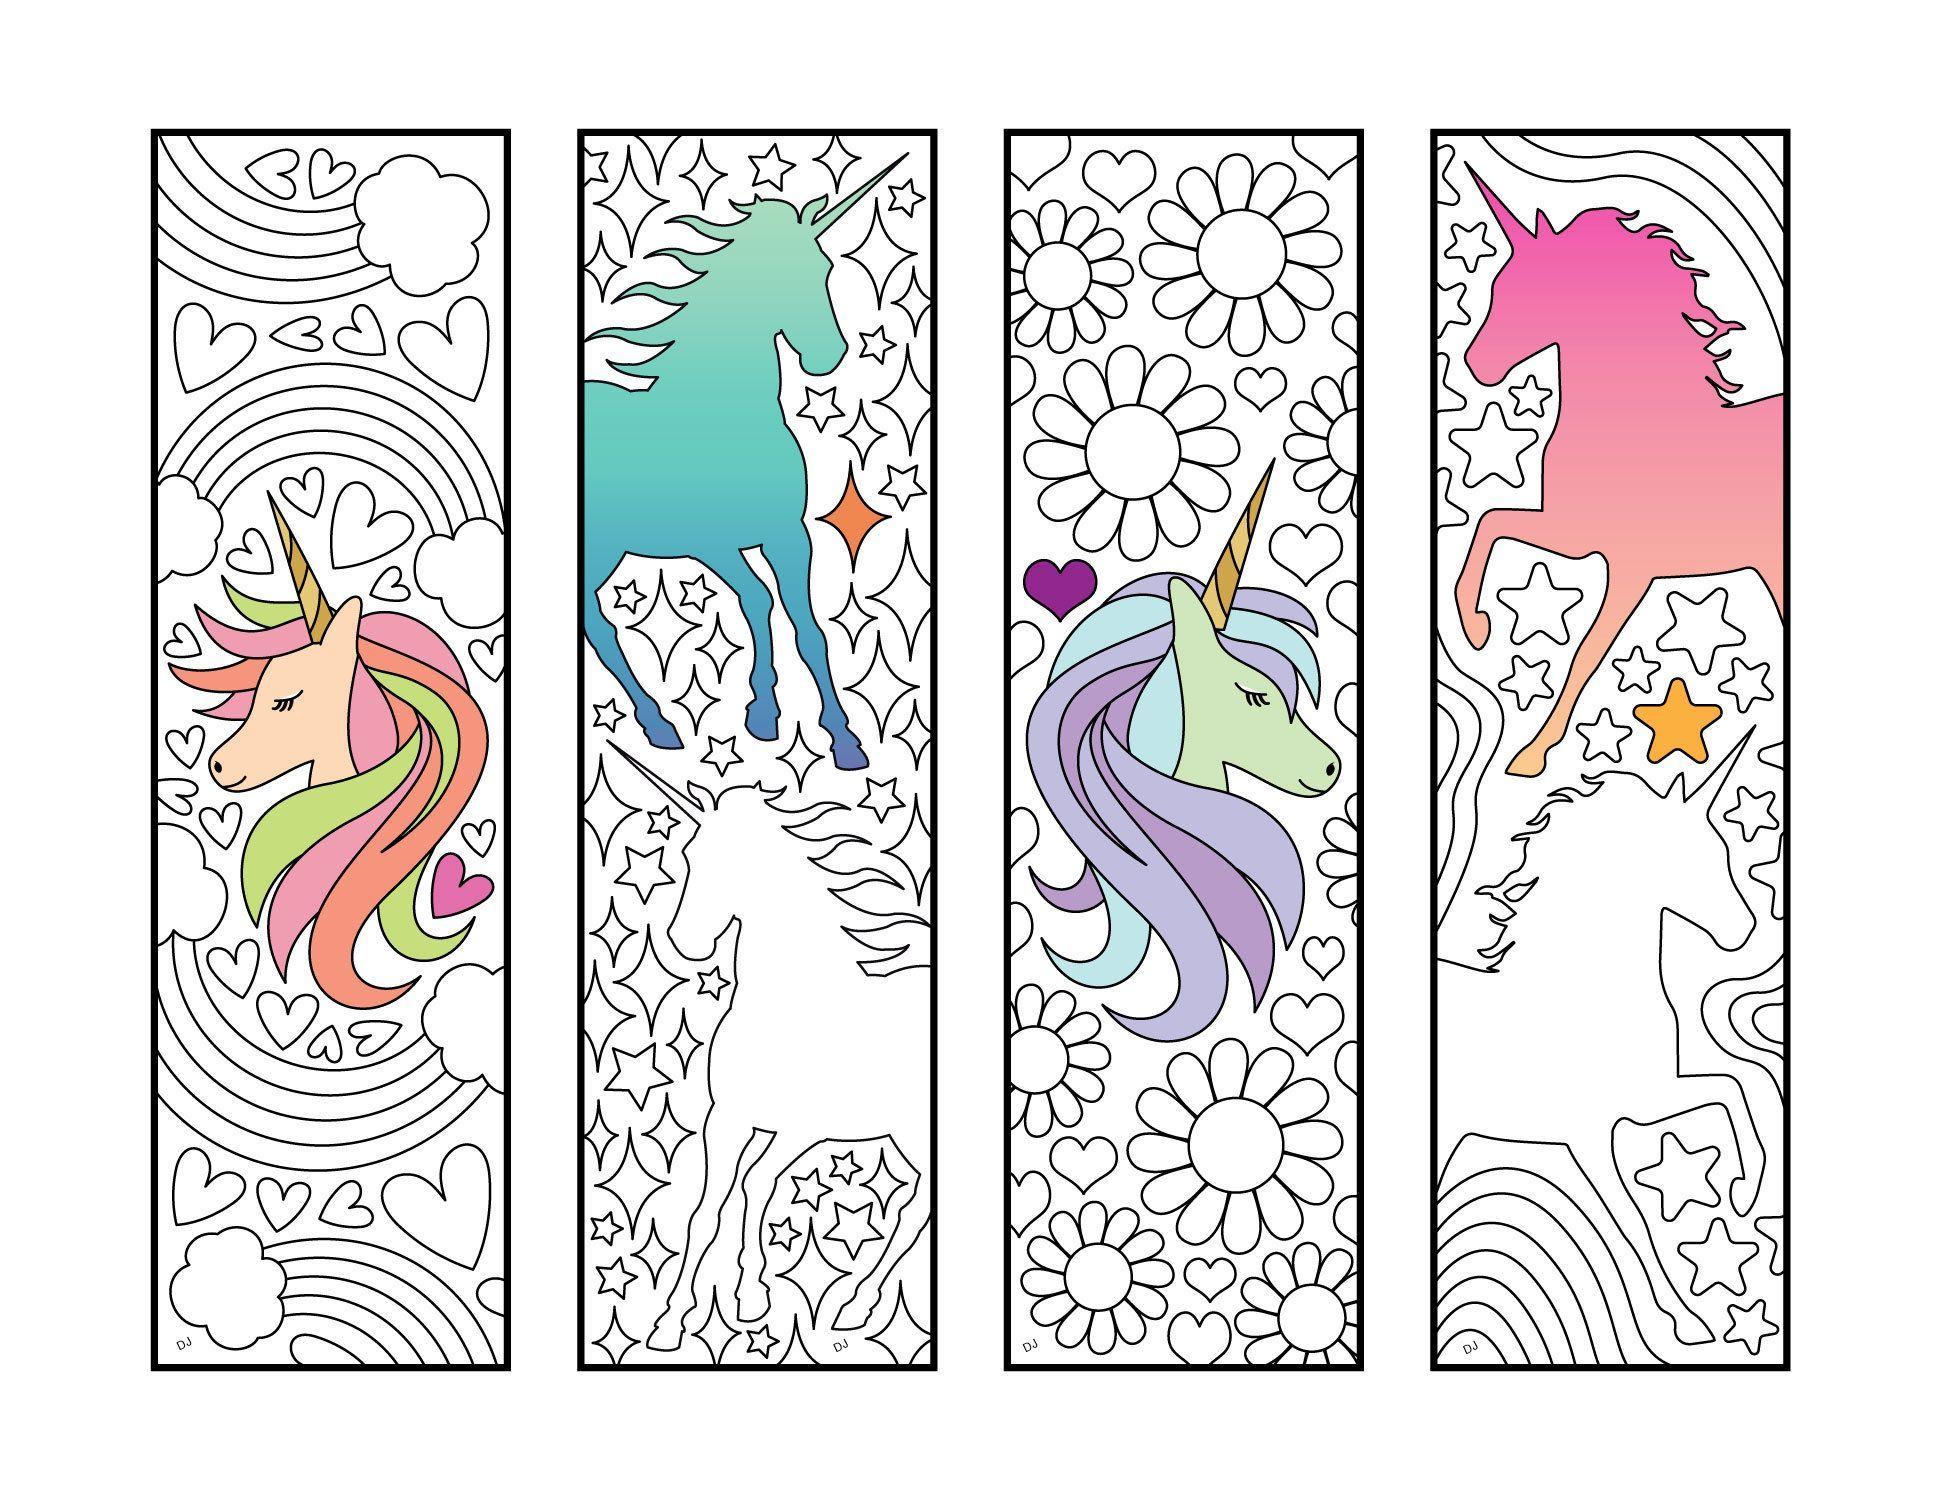 malvorlagen karneval unicorn  tiffanylovesbooks